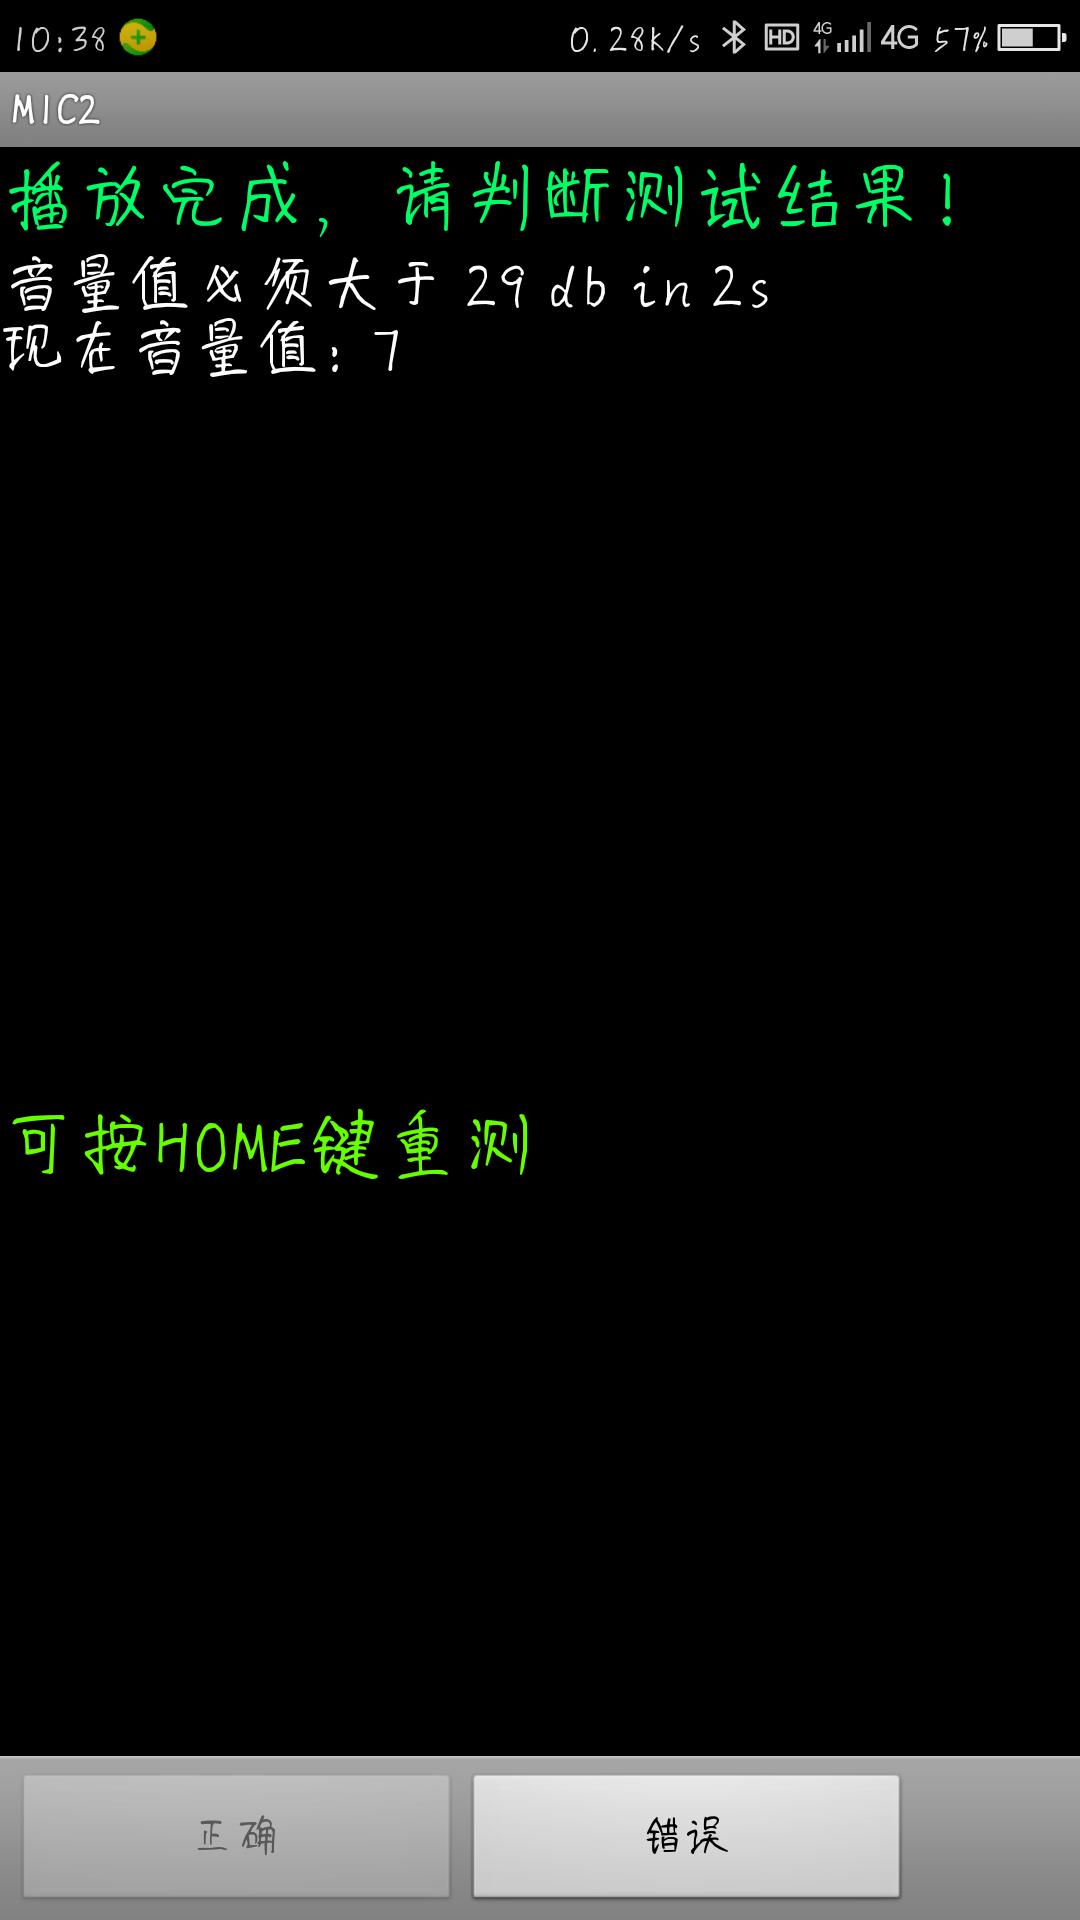 Screenshot_2019-04-09-10-38-41.png